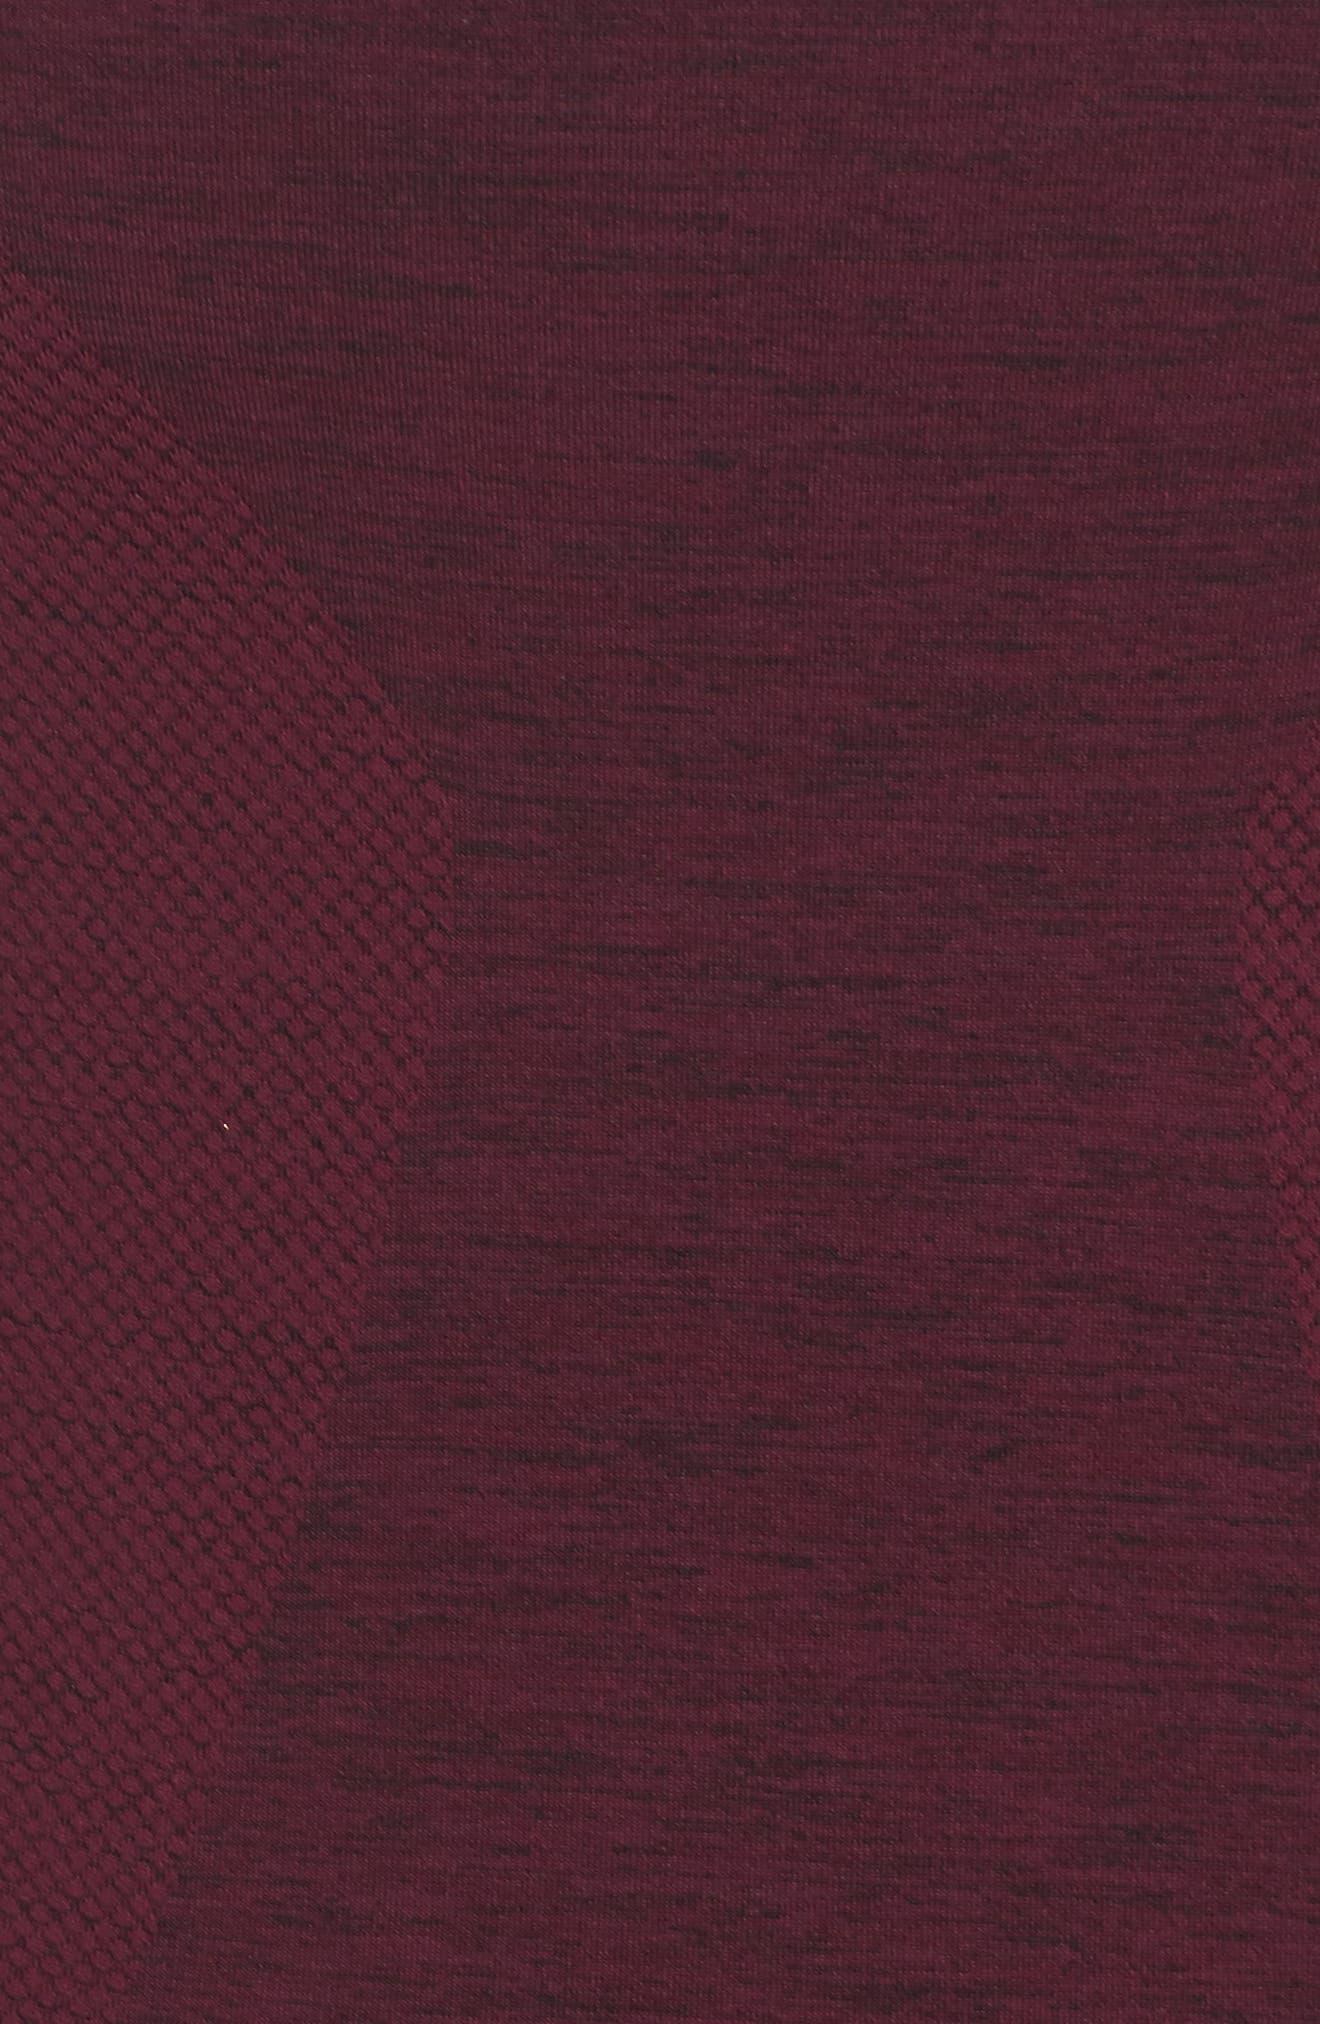 Colours Long Sleeve Top,                             Alternate thumbnail 5, color,                             930